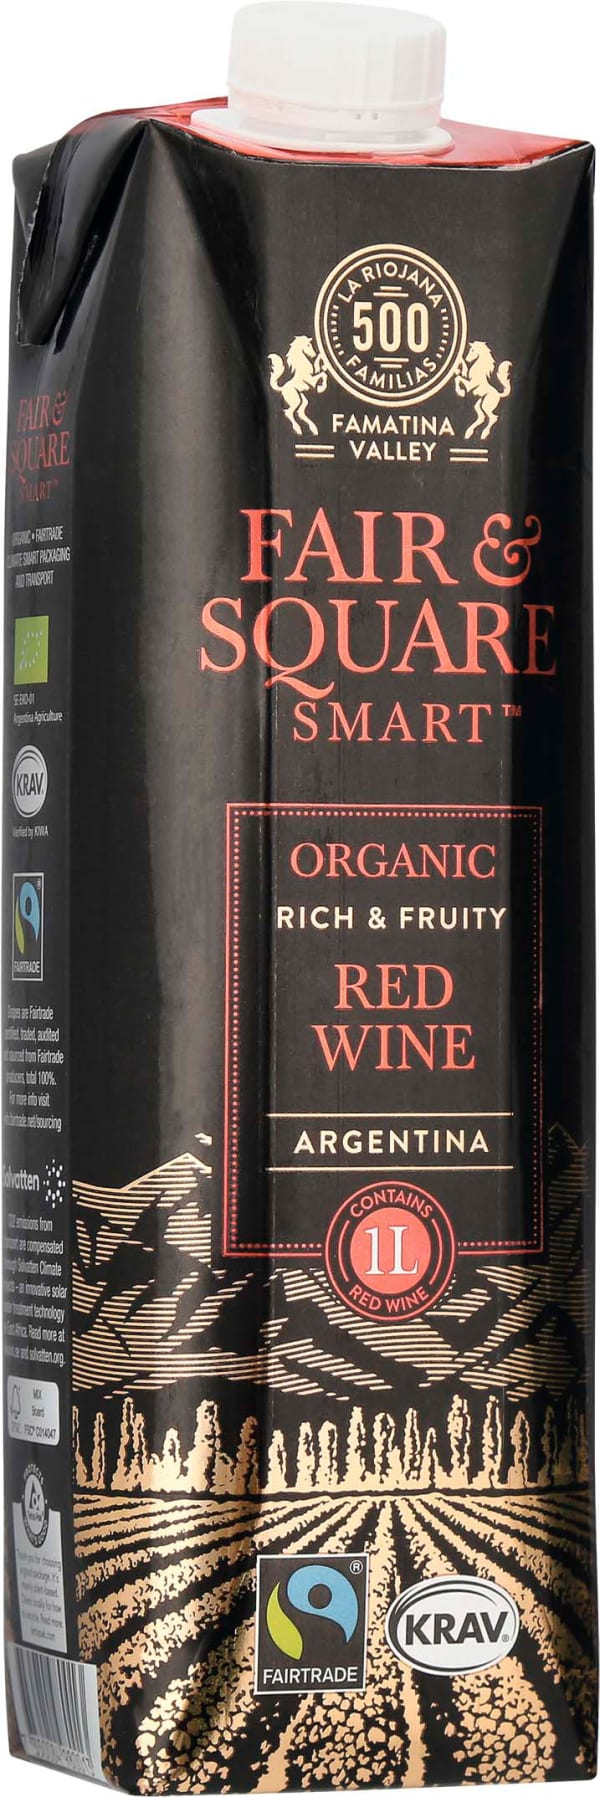 Fair & Square Red 2020 kartongförpackning